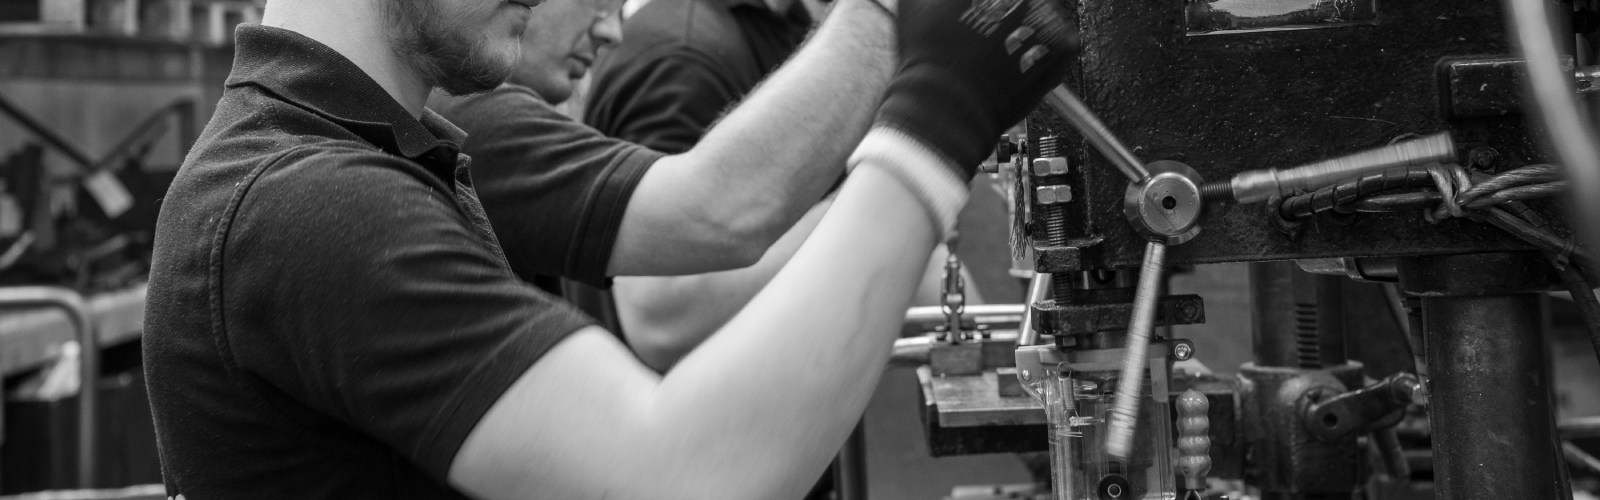 CNC Tube Manipulators and Pipe Fabricators